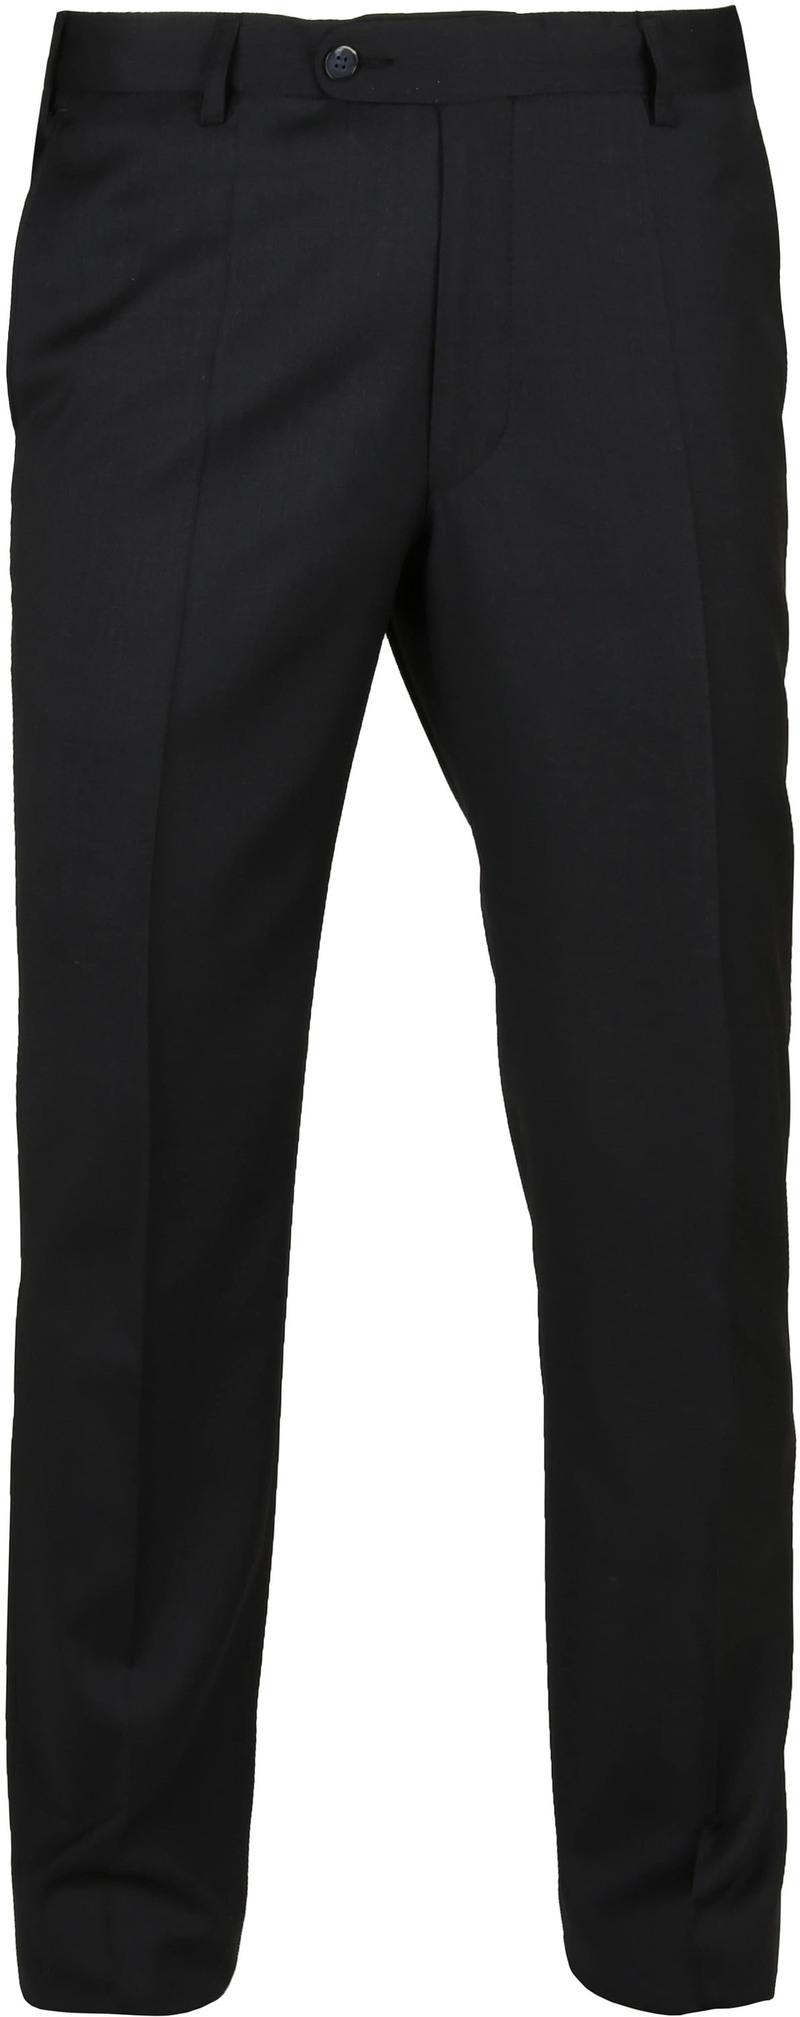 Suitable Pantalon Piga Anthracite photo 0